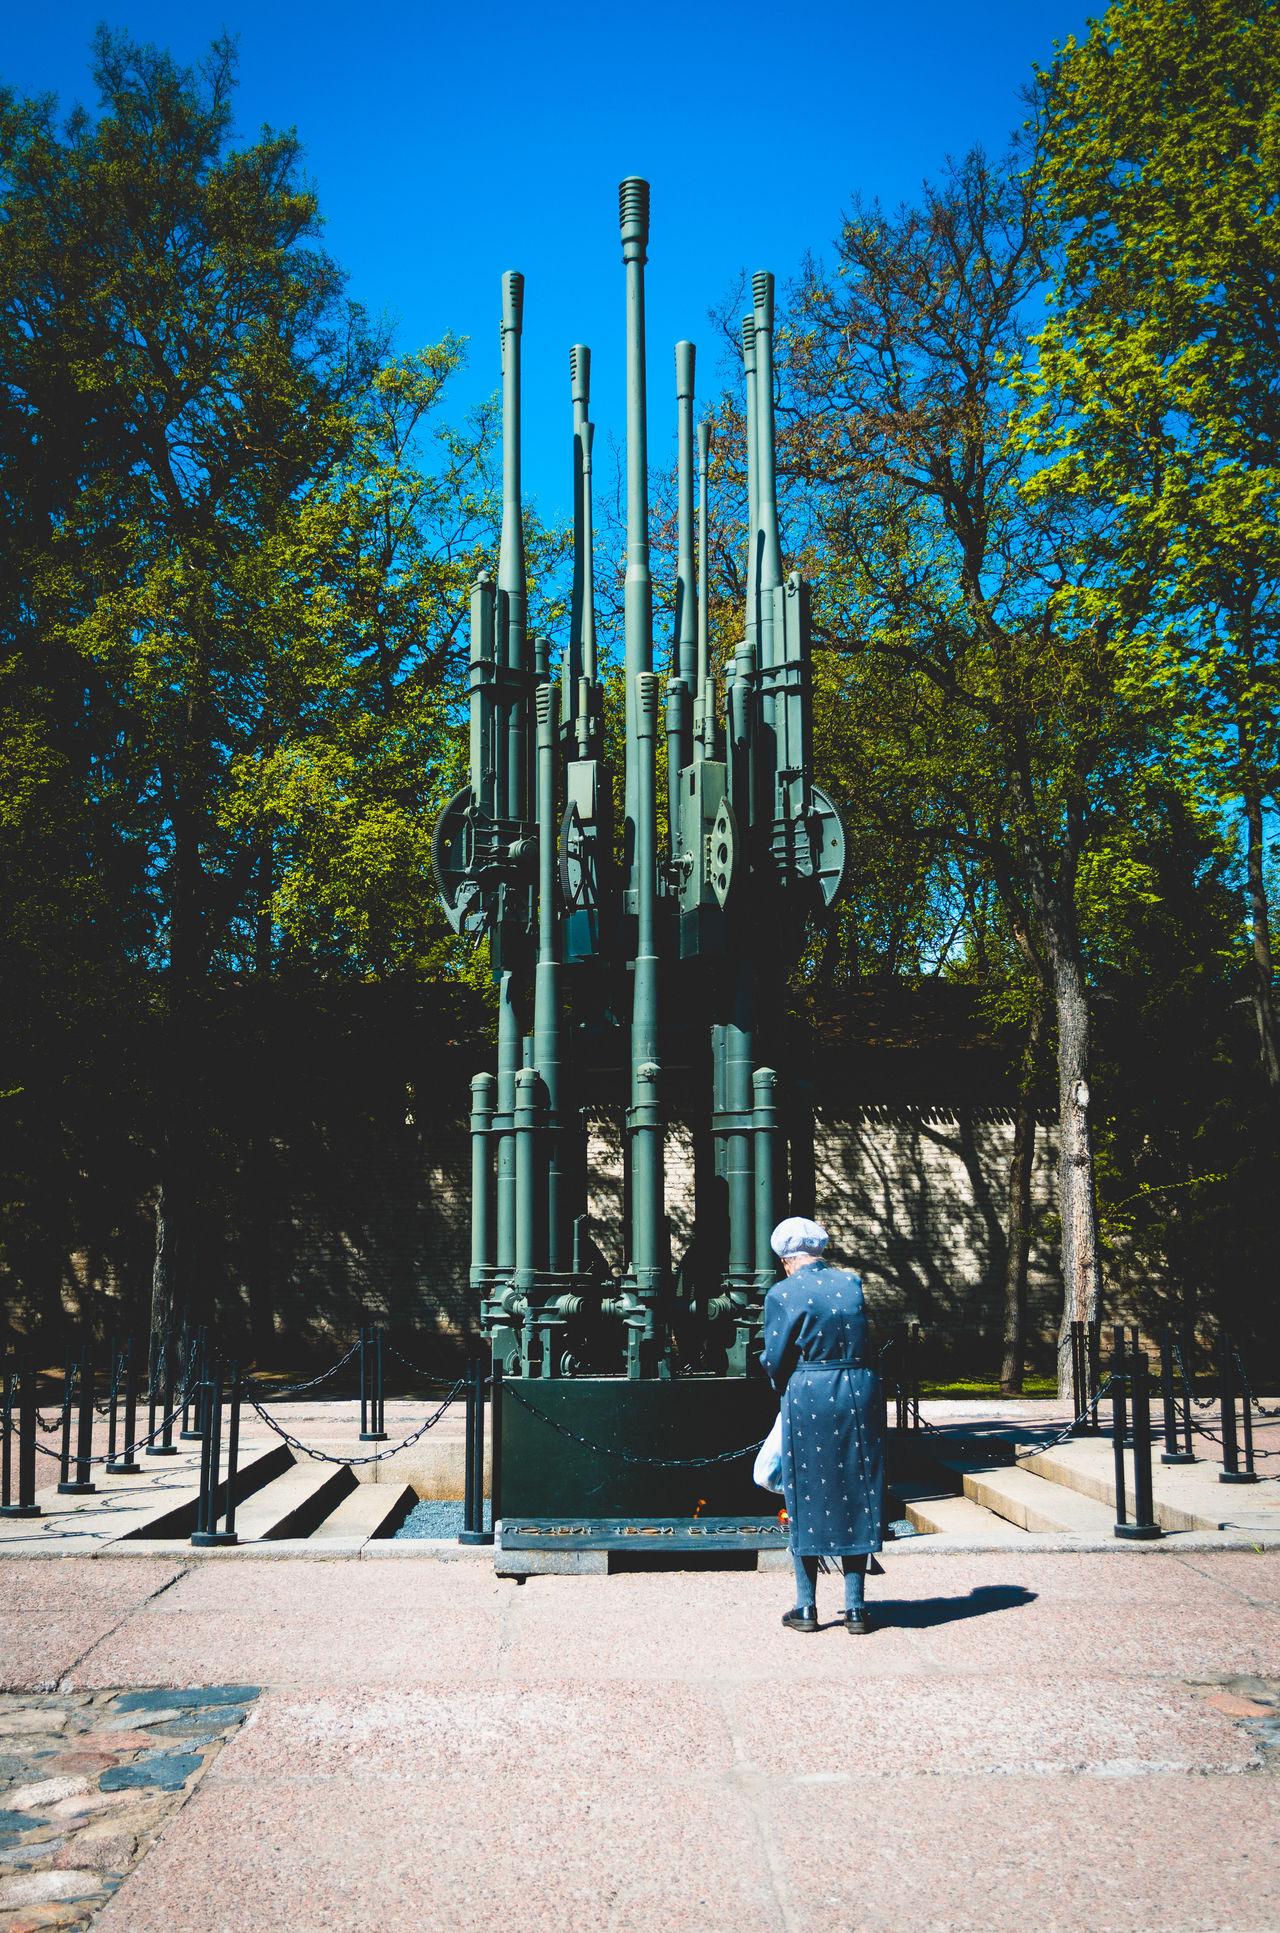 City Grandma Honor Memories Monument Old People Outdoors Pskov Russia Tree War Weapon